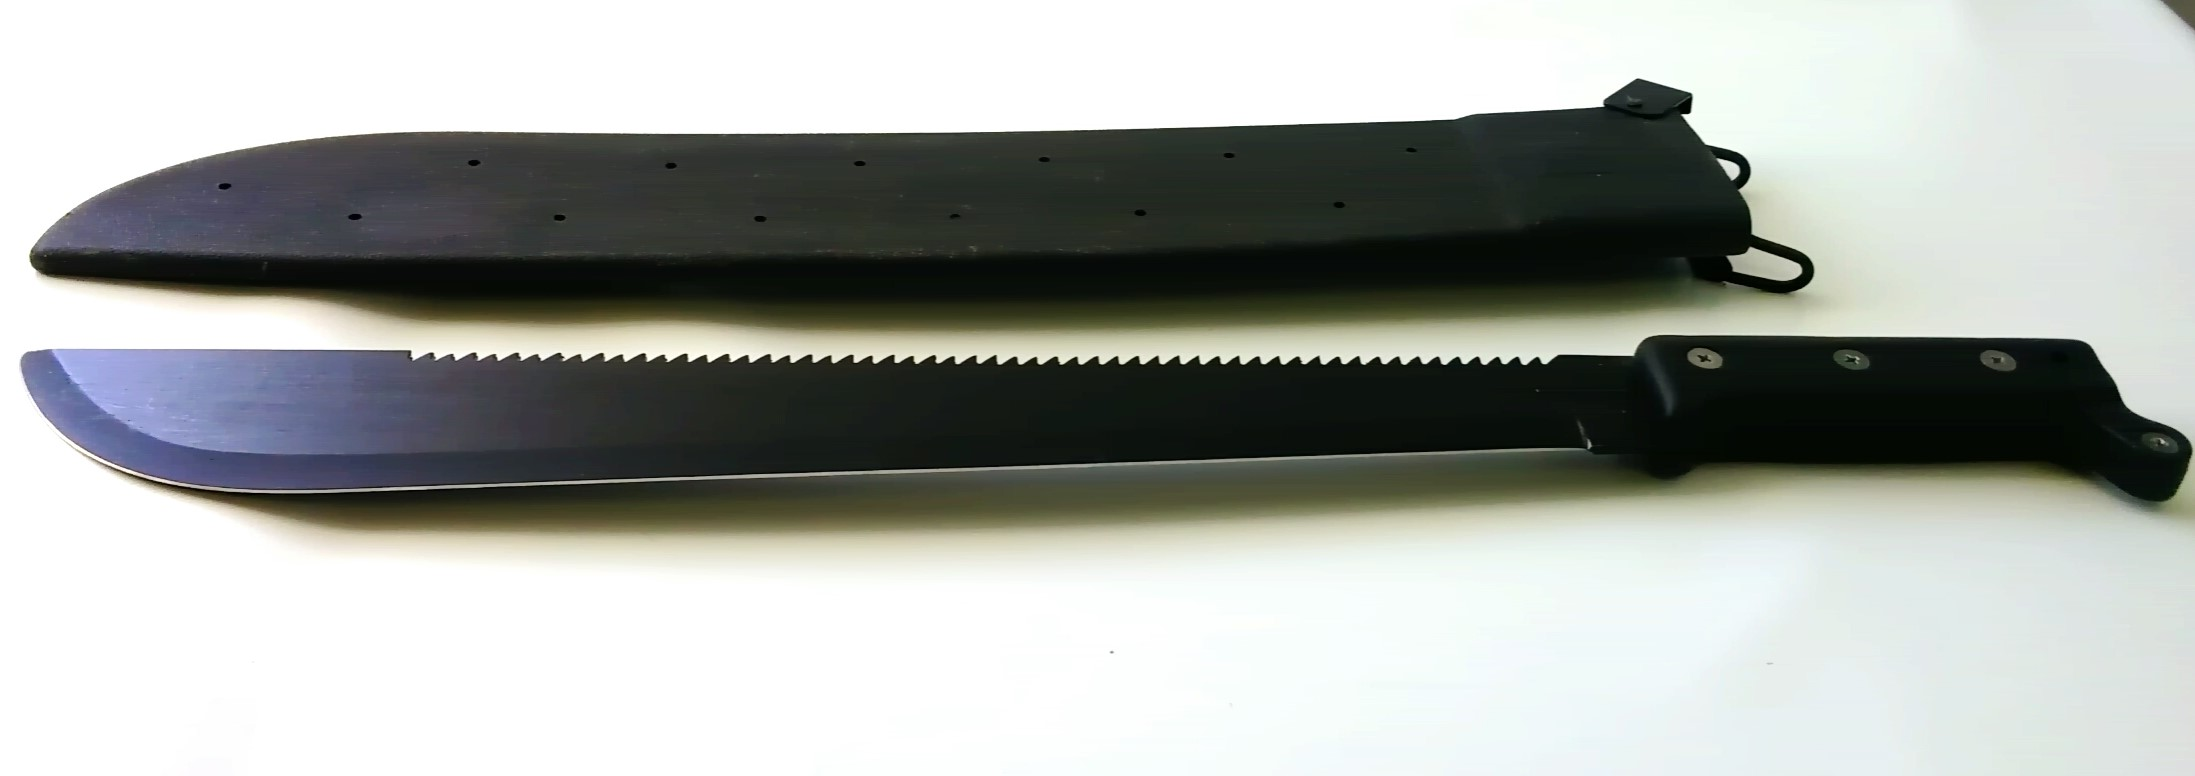 U.S black machette with plastic sheath(12022)